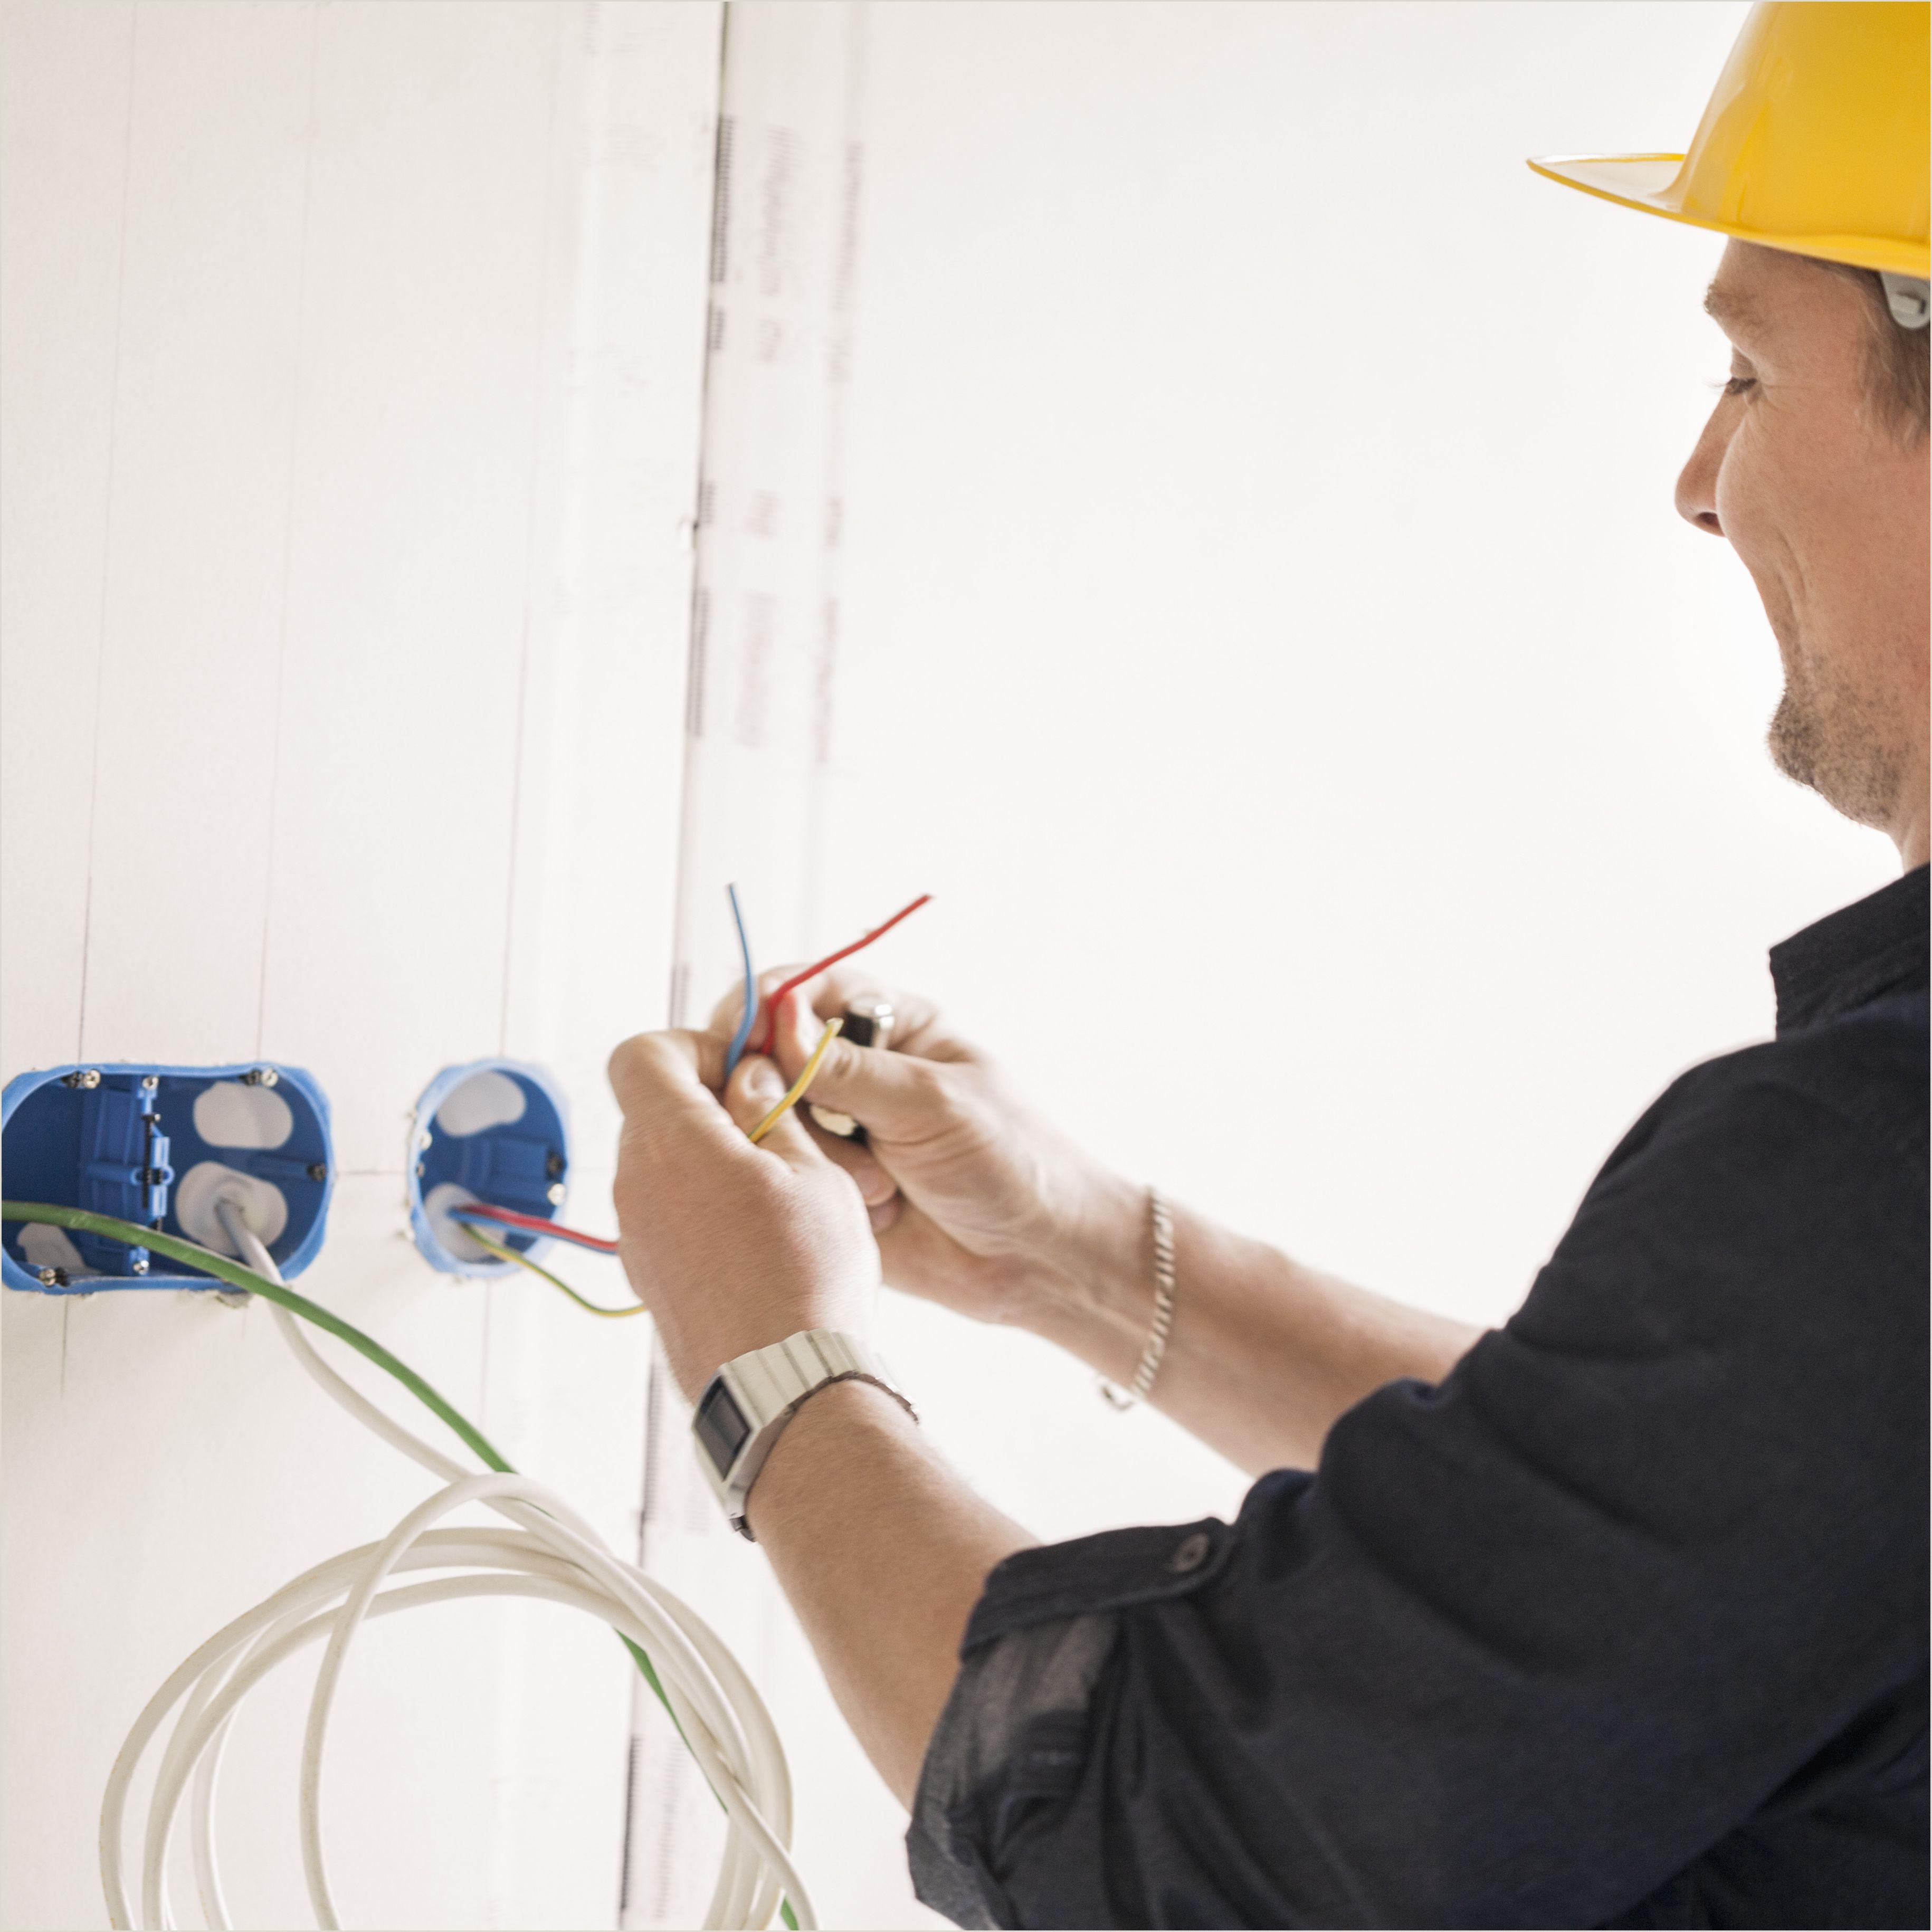 Cv Samples for Uae Jobs Sample Electrician Resume and Skills List